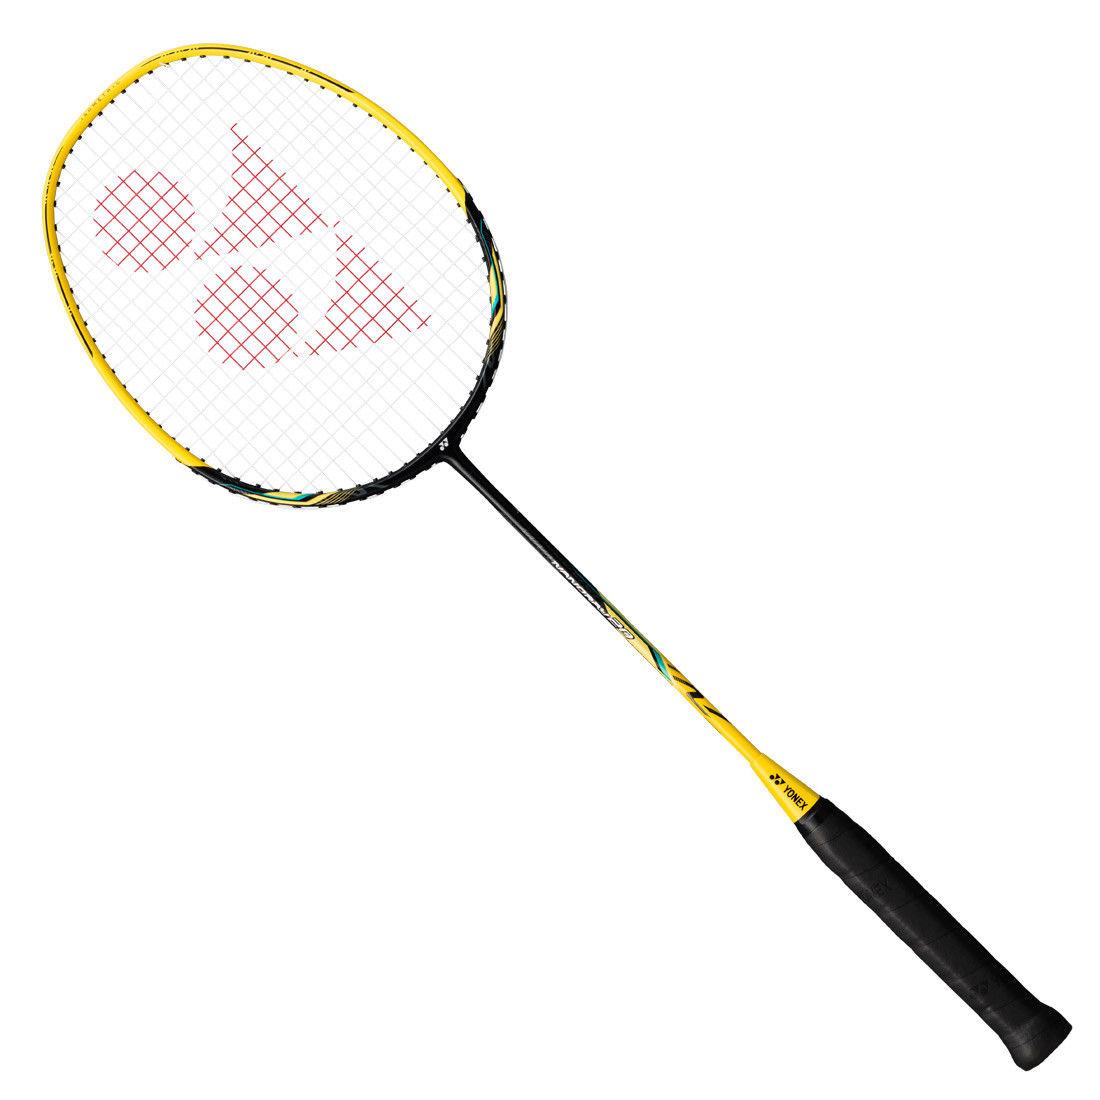 YONEX NANORAY 20 STRUNG - Badminton Store